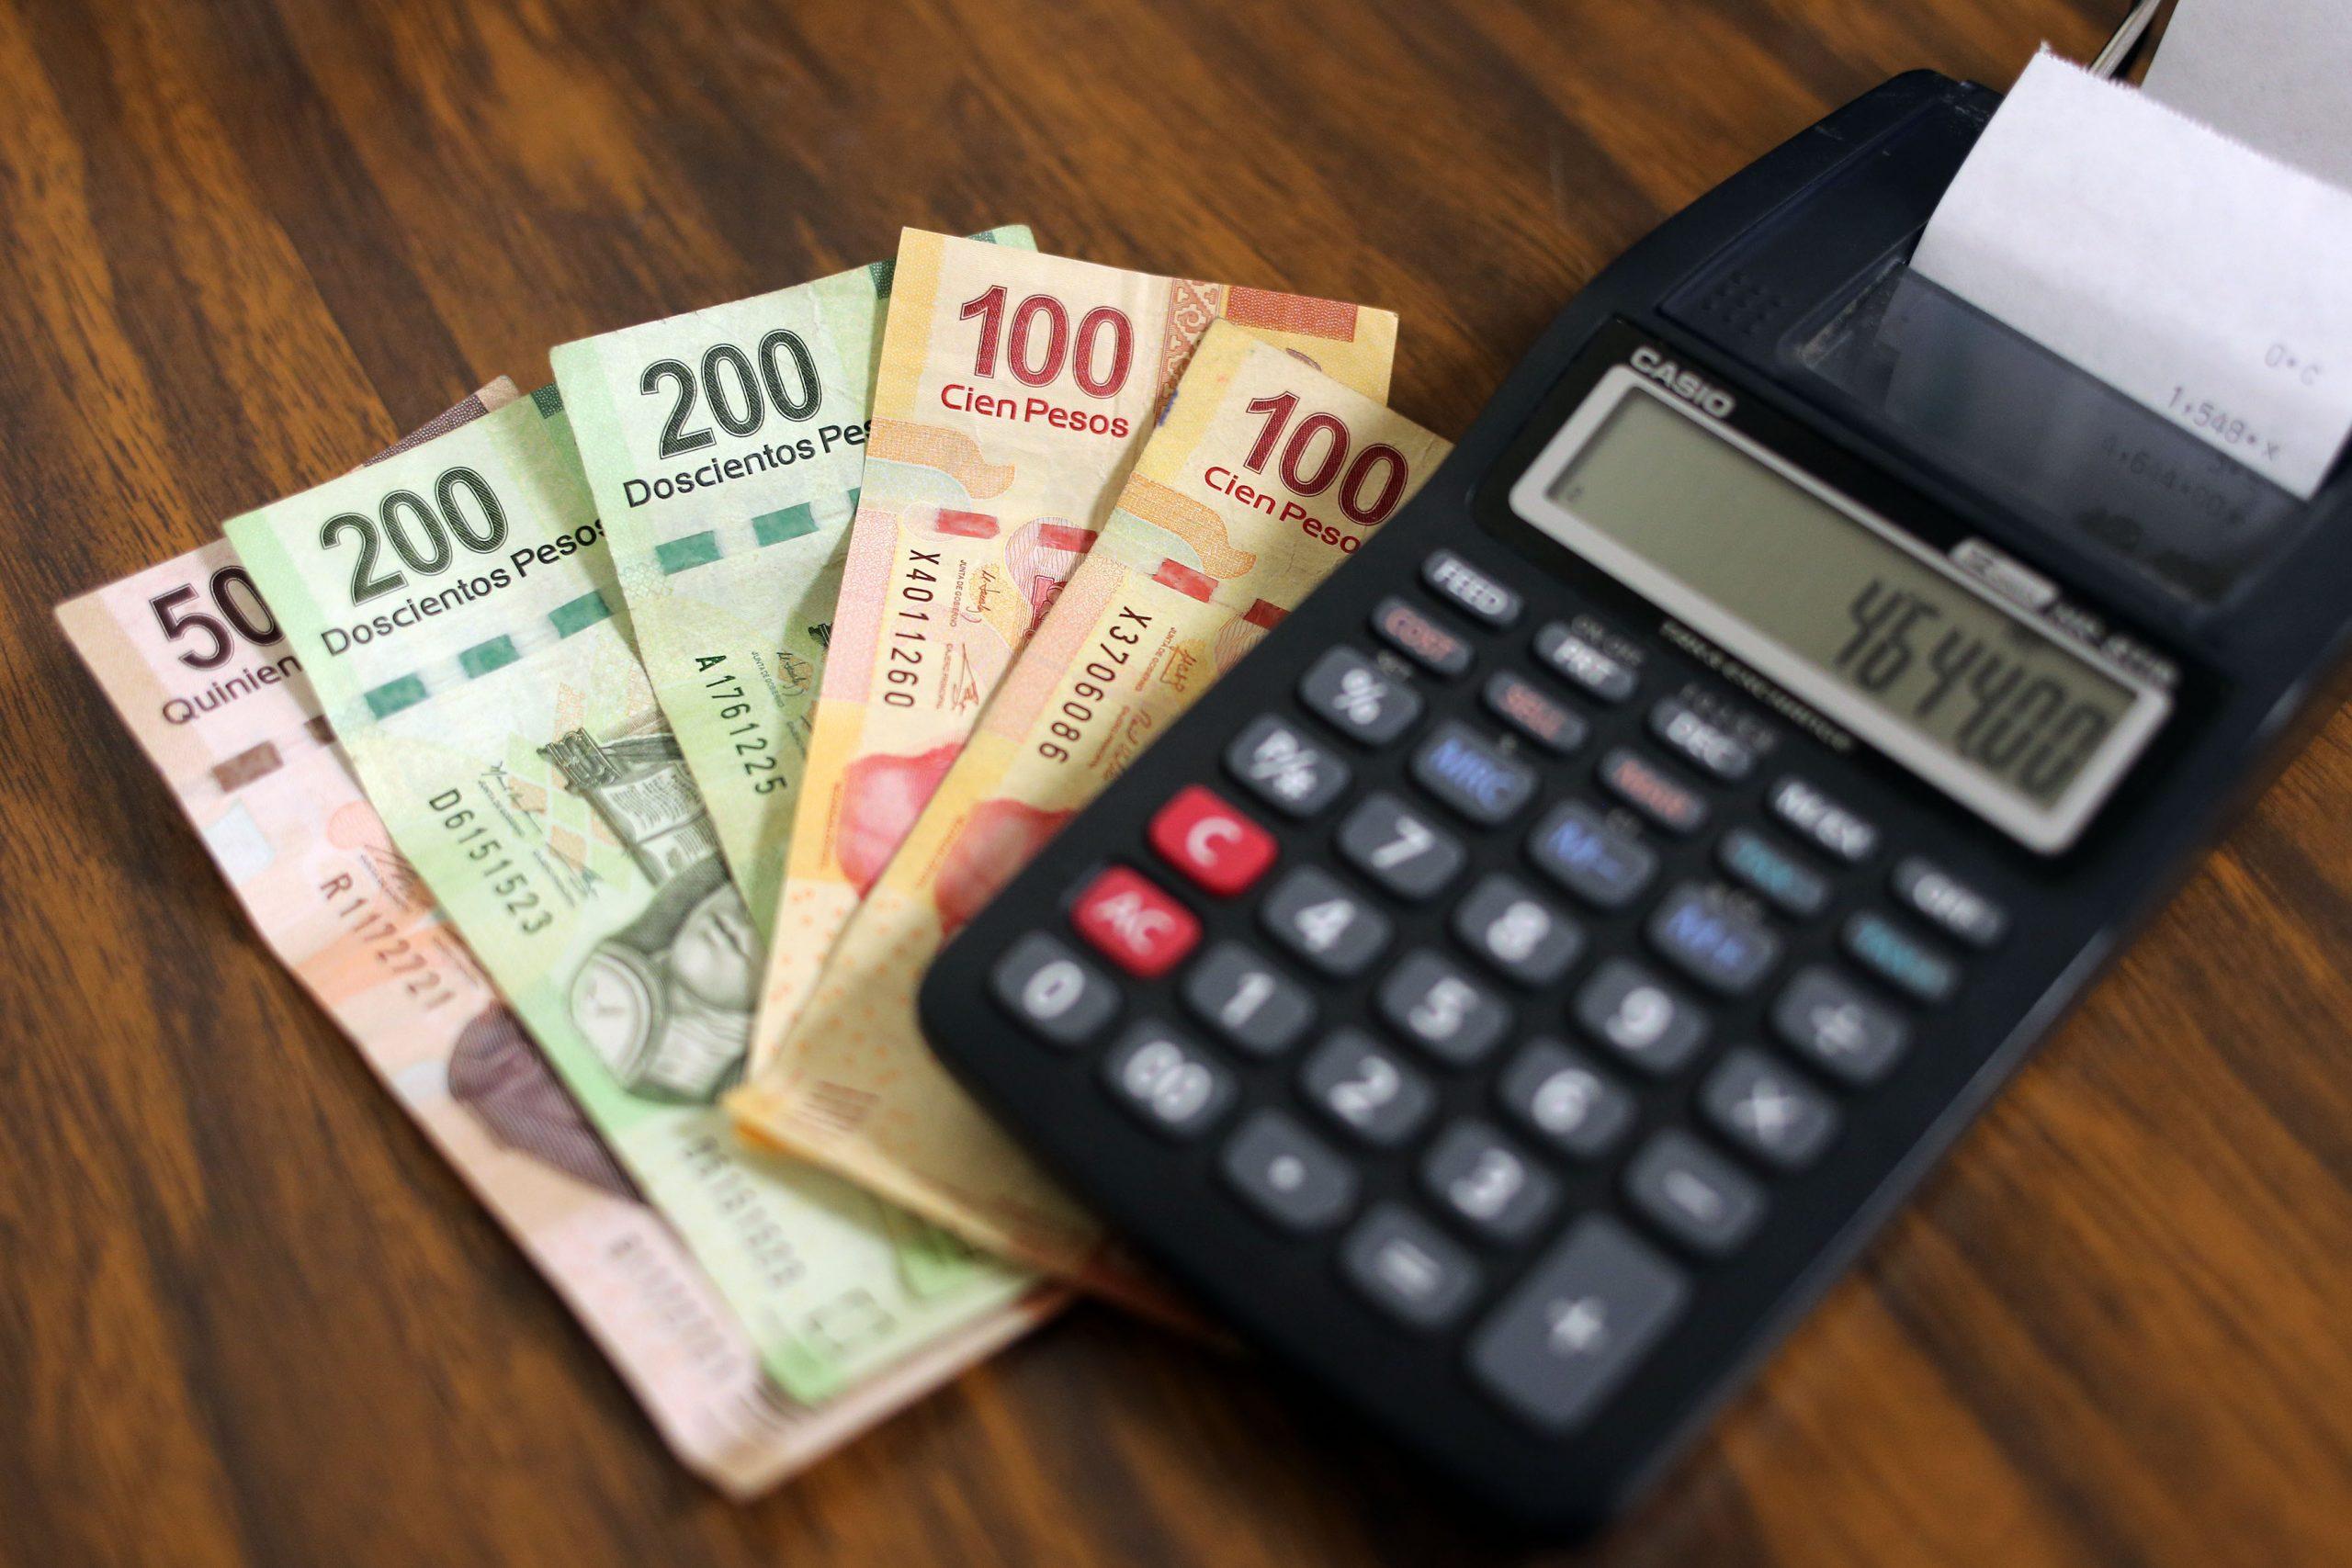 ajuste anual, calculo anual, sat, asesoria legal, fiscal, contable